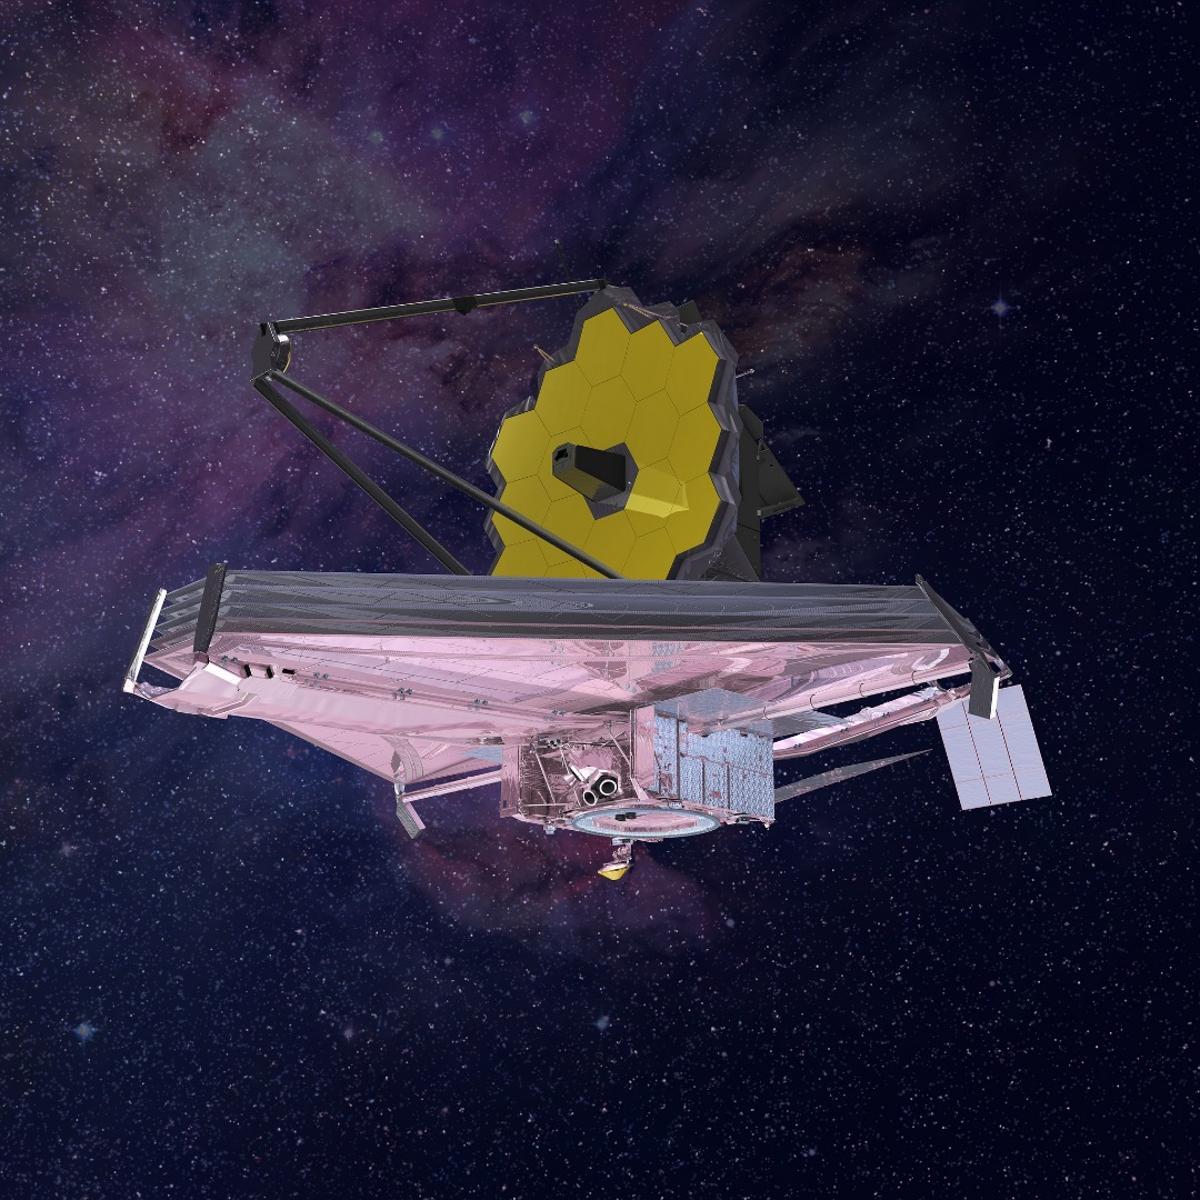 Artist's impression of the James Webb Space Telescope in orbit